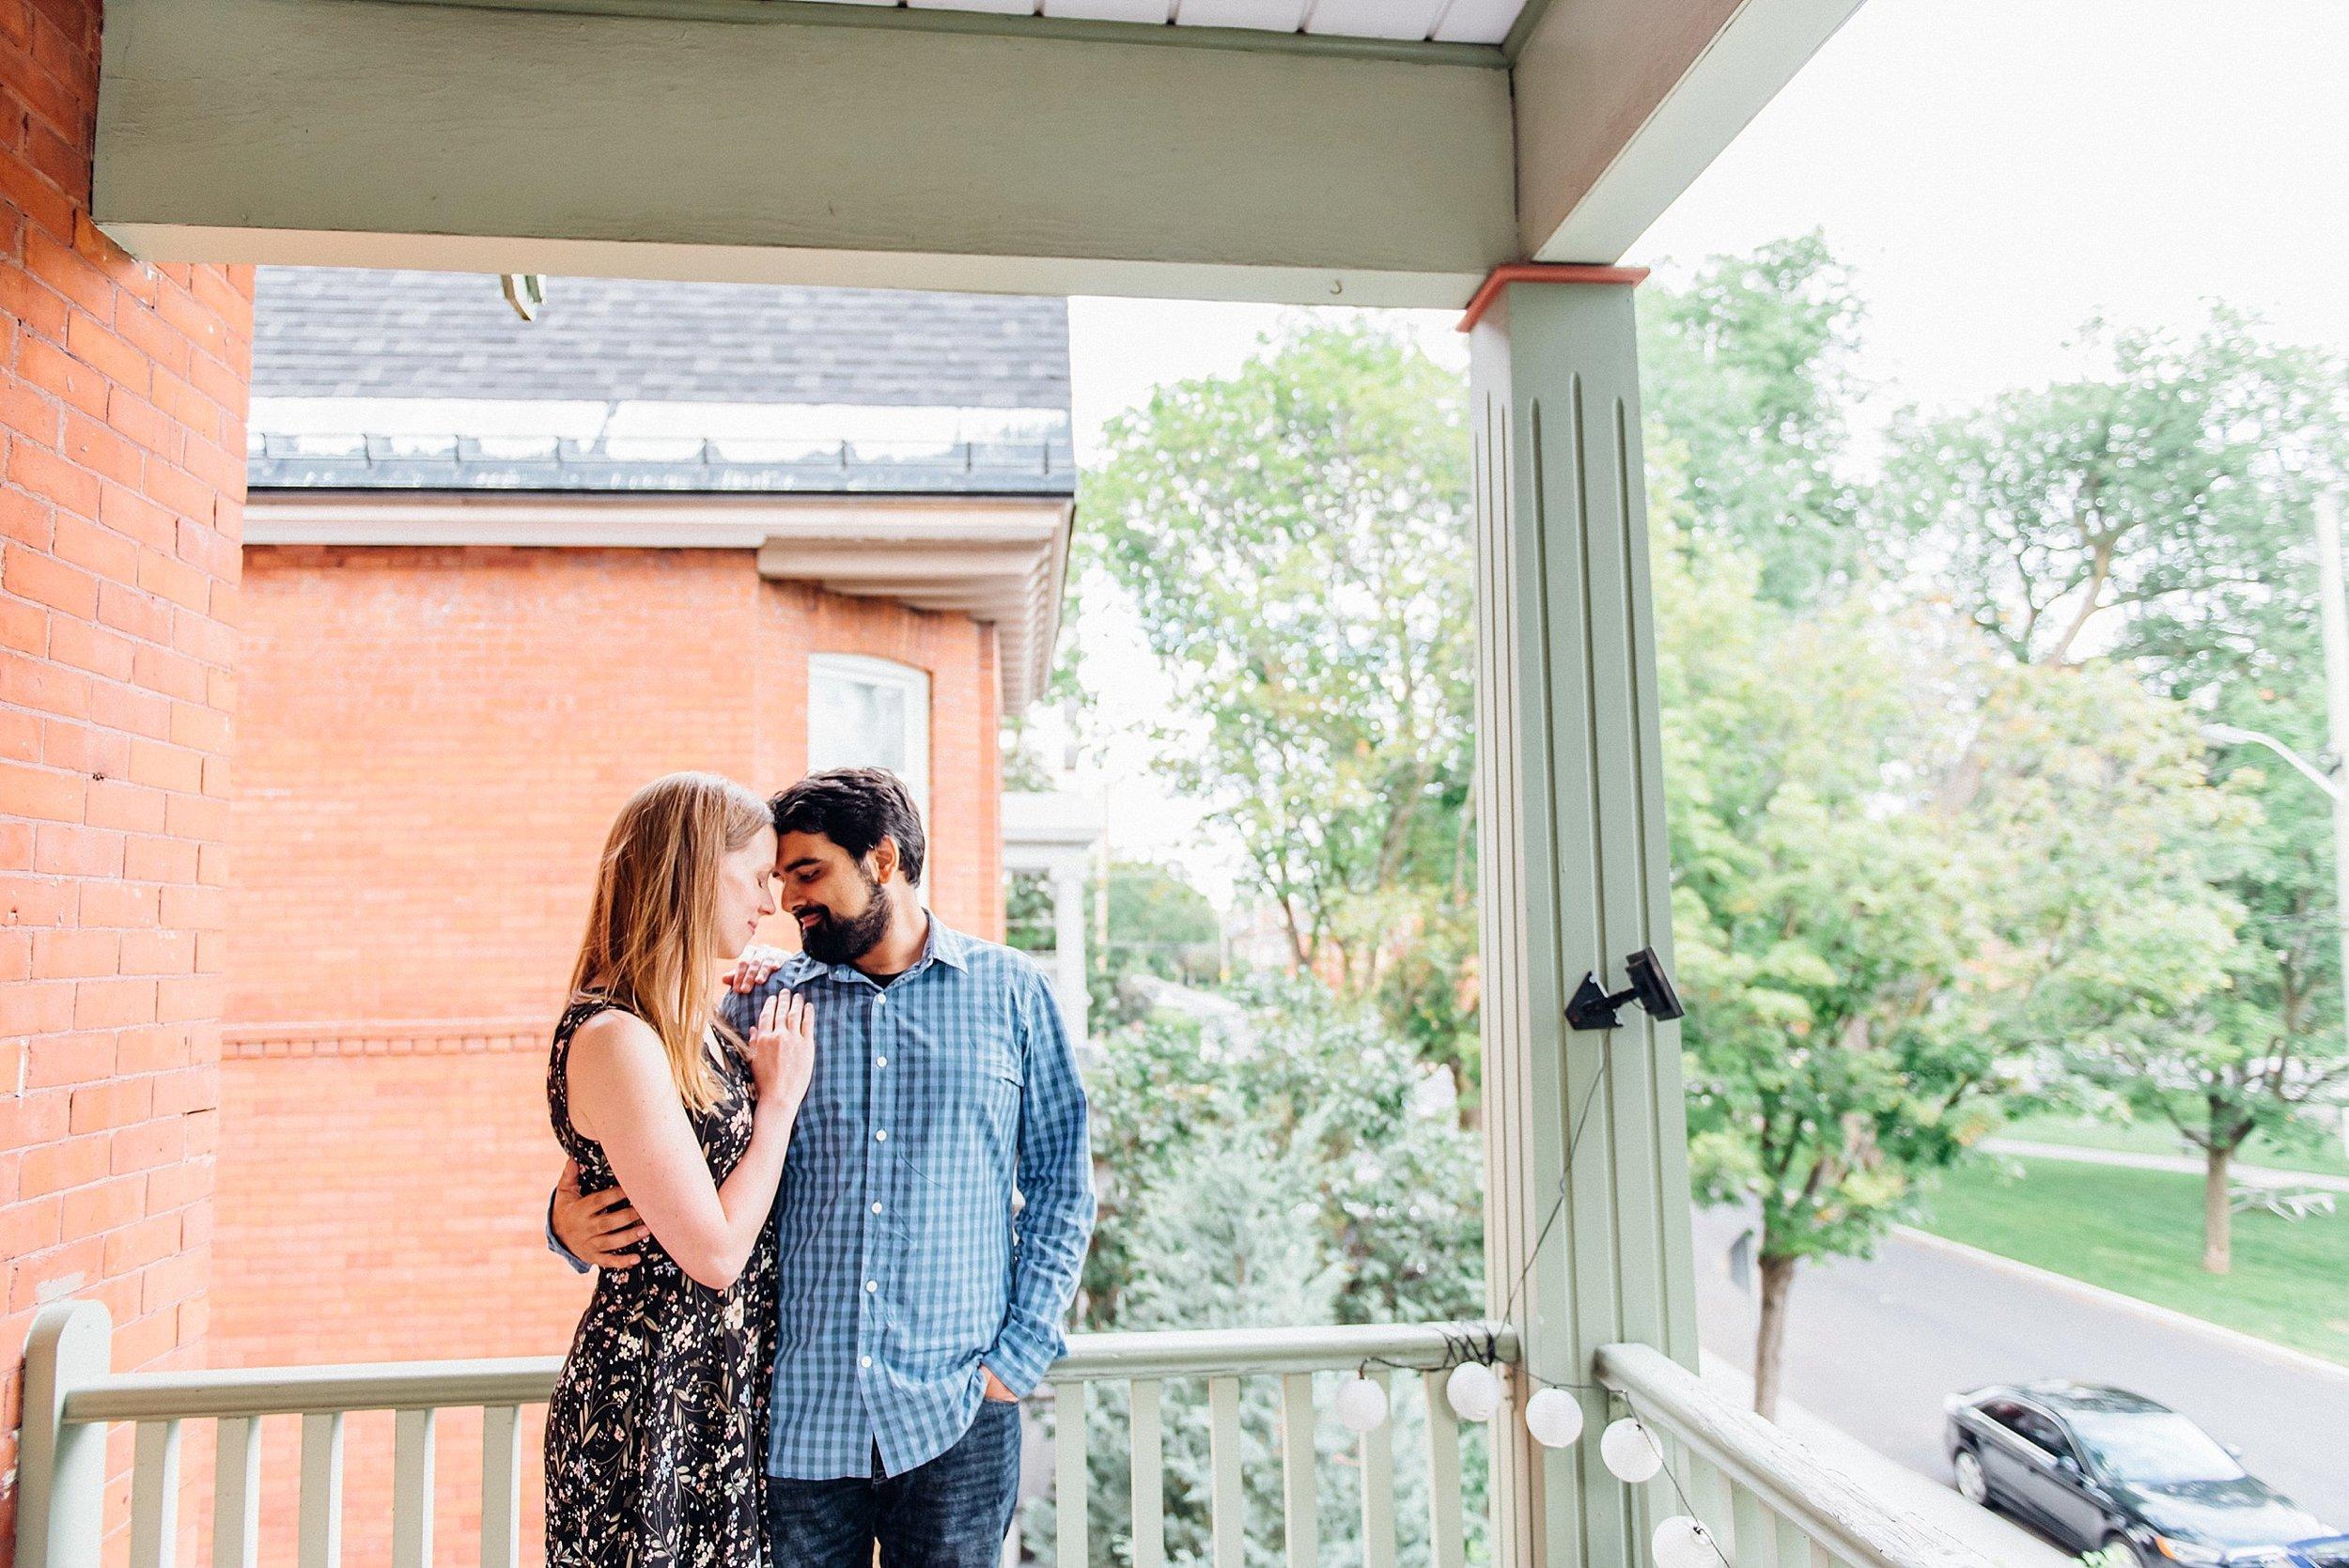 Ali and Batoul Photography - light, airy, indie documentary Ottawa wedding photographer_0236.jpg